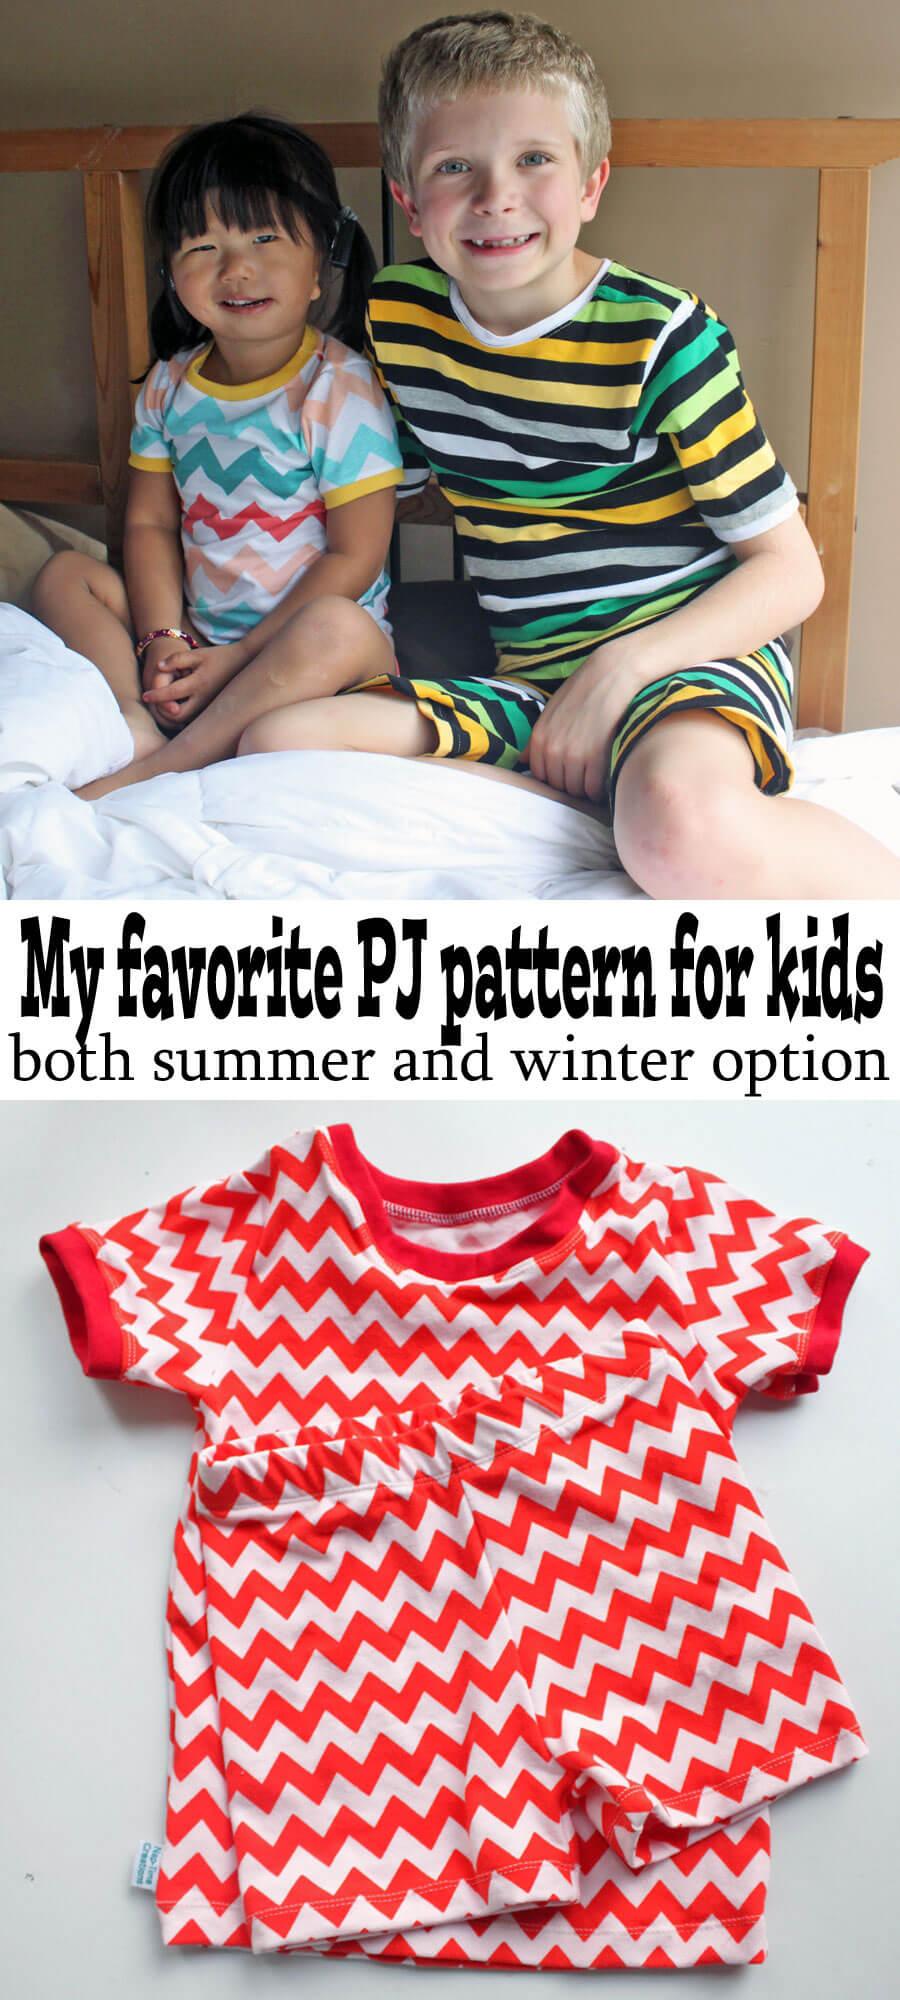 My-favorite-PJ-Pattern-for-kids-the-Alex-and-Anna-Pj-pattern